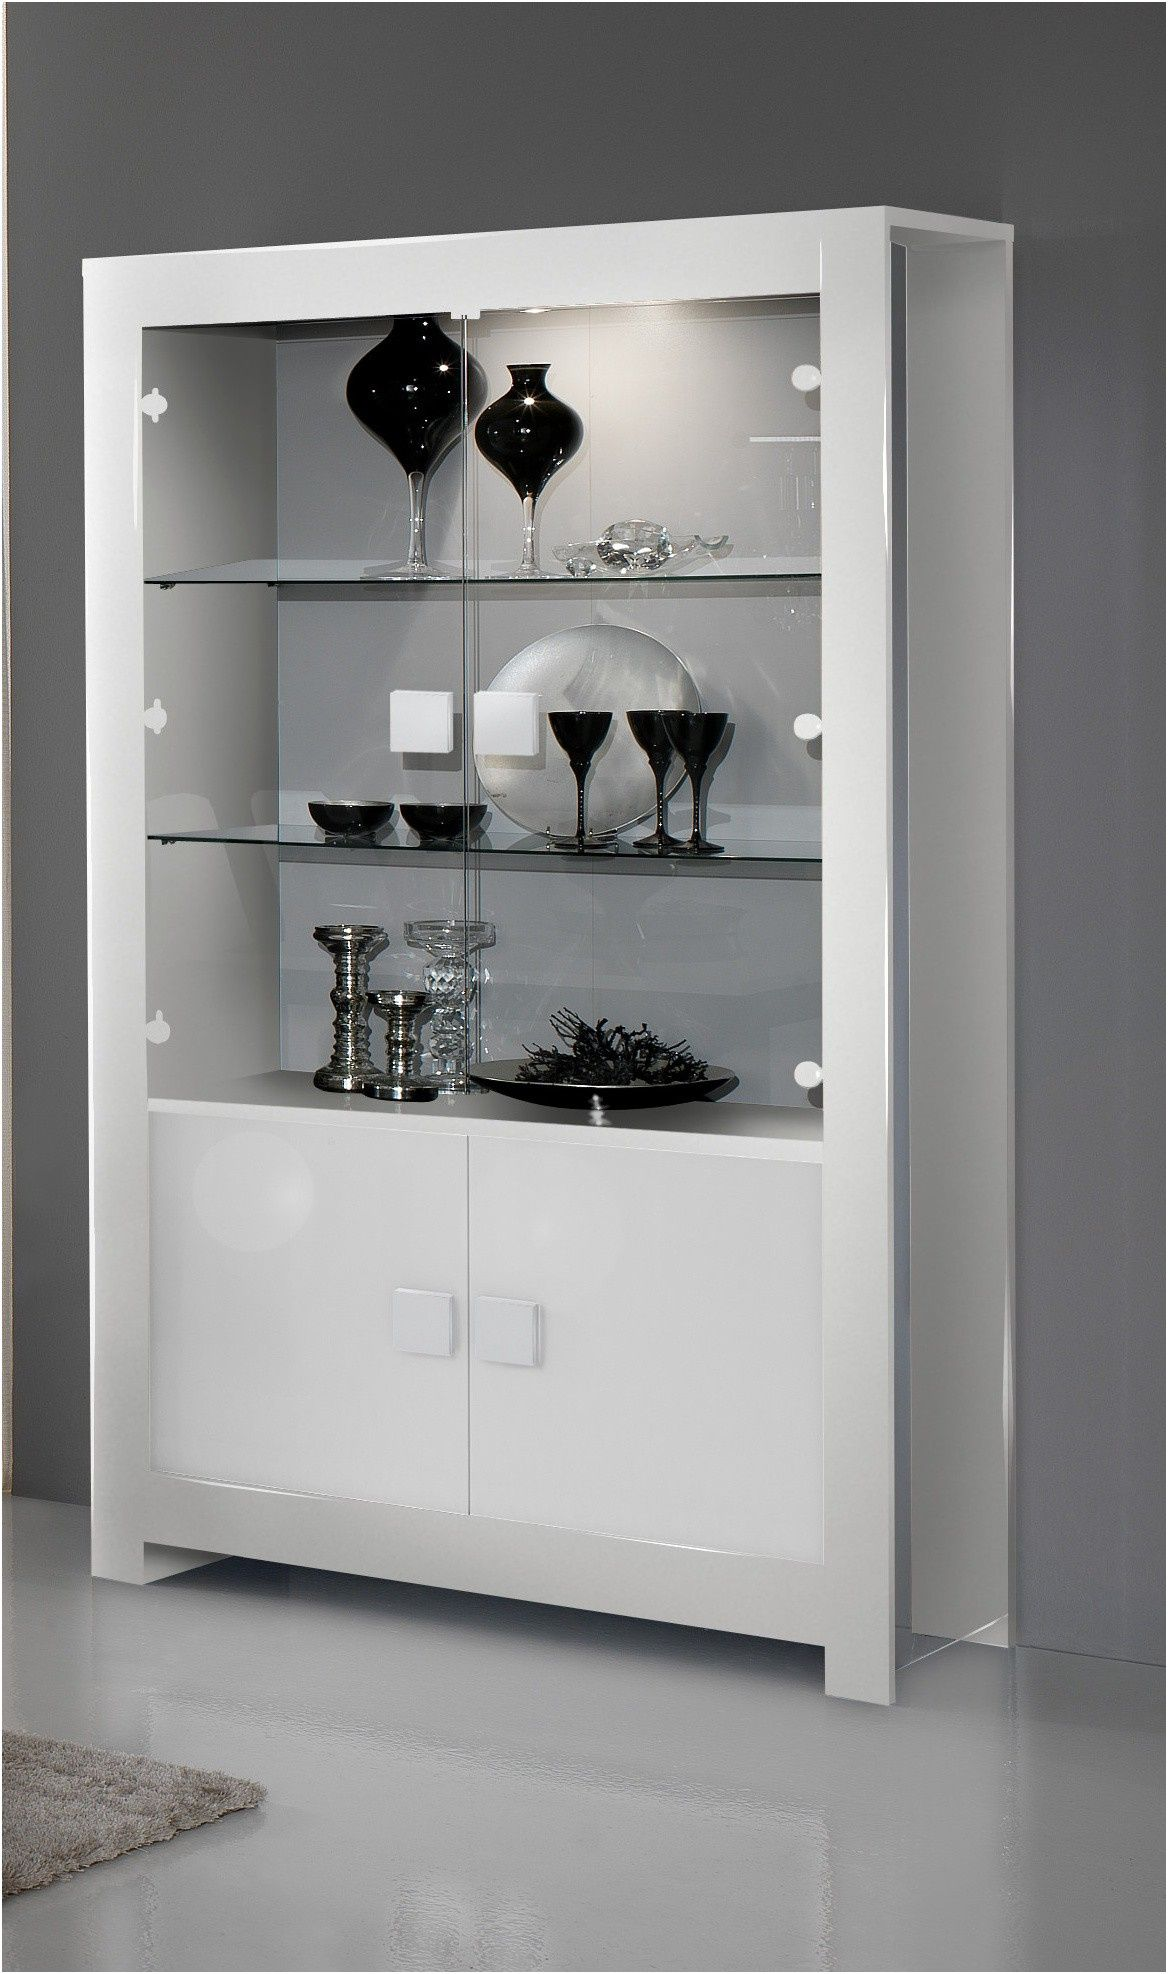 9 Largement Meuble Vitrine Blanc Kitchen Interior Design Decor Living Room Decor Cozy Dining Room Contemporary